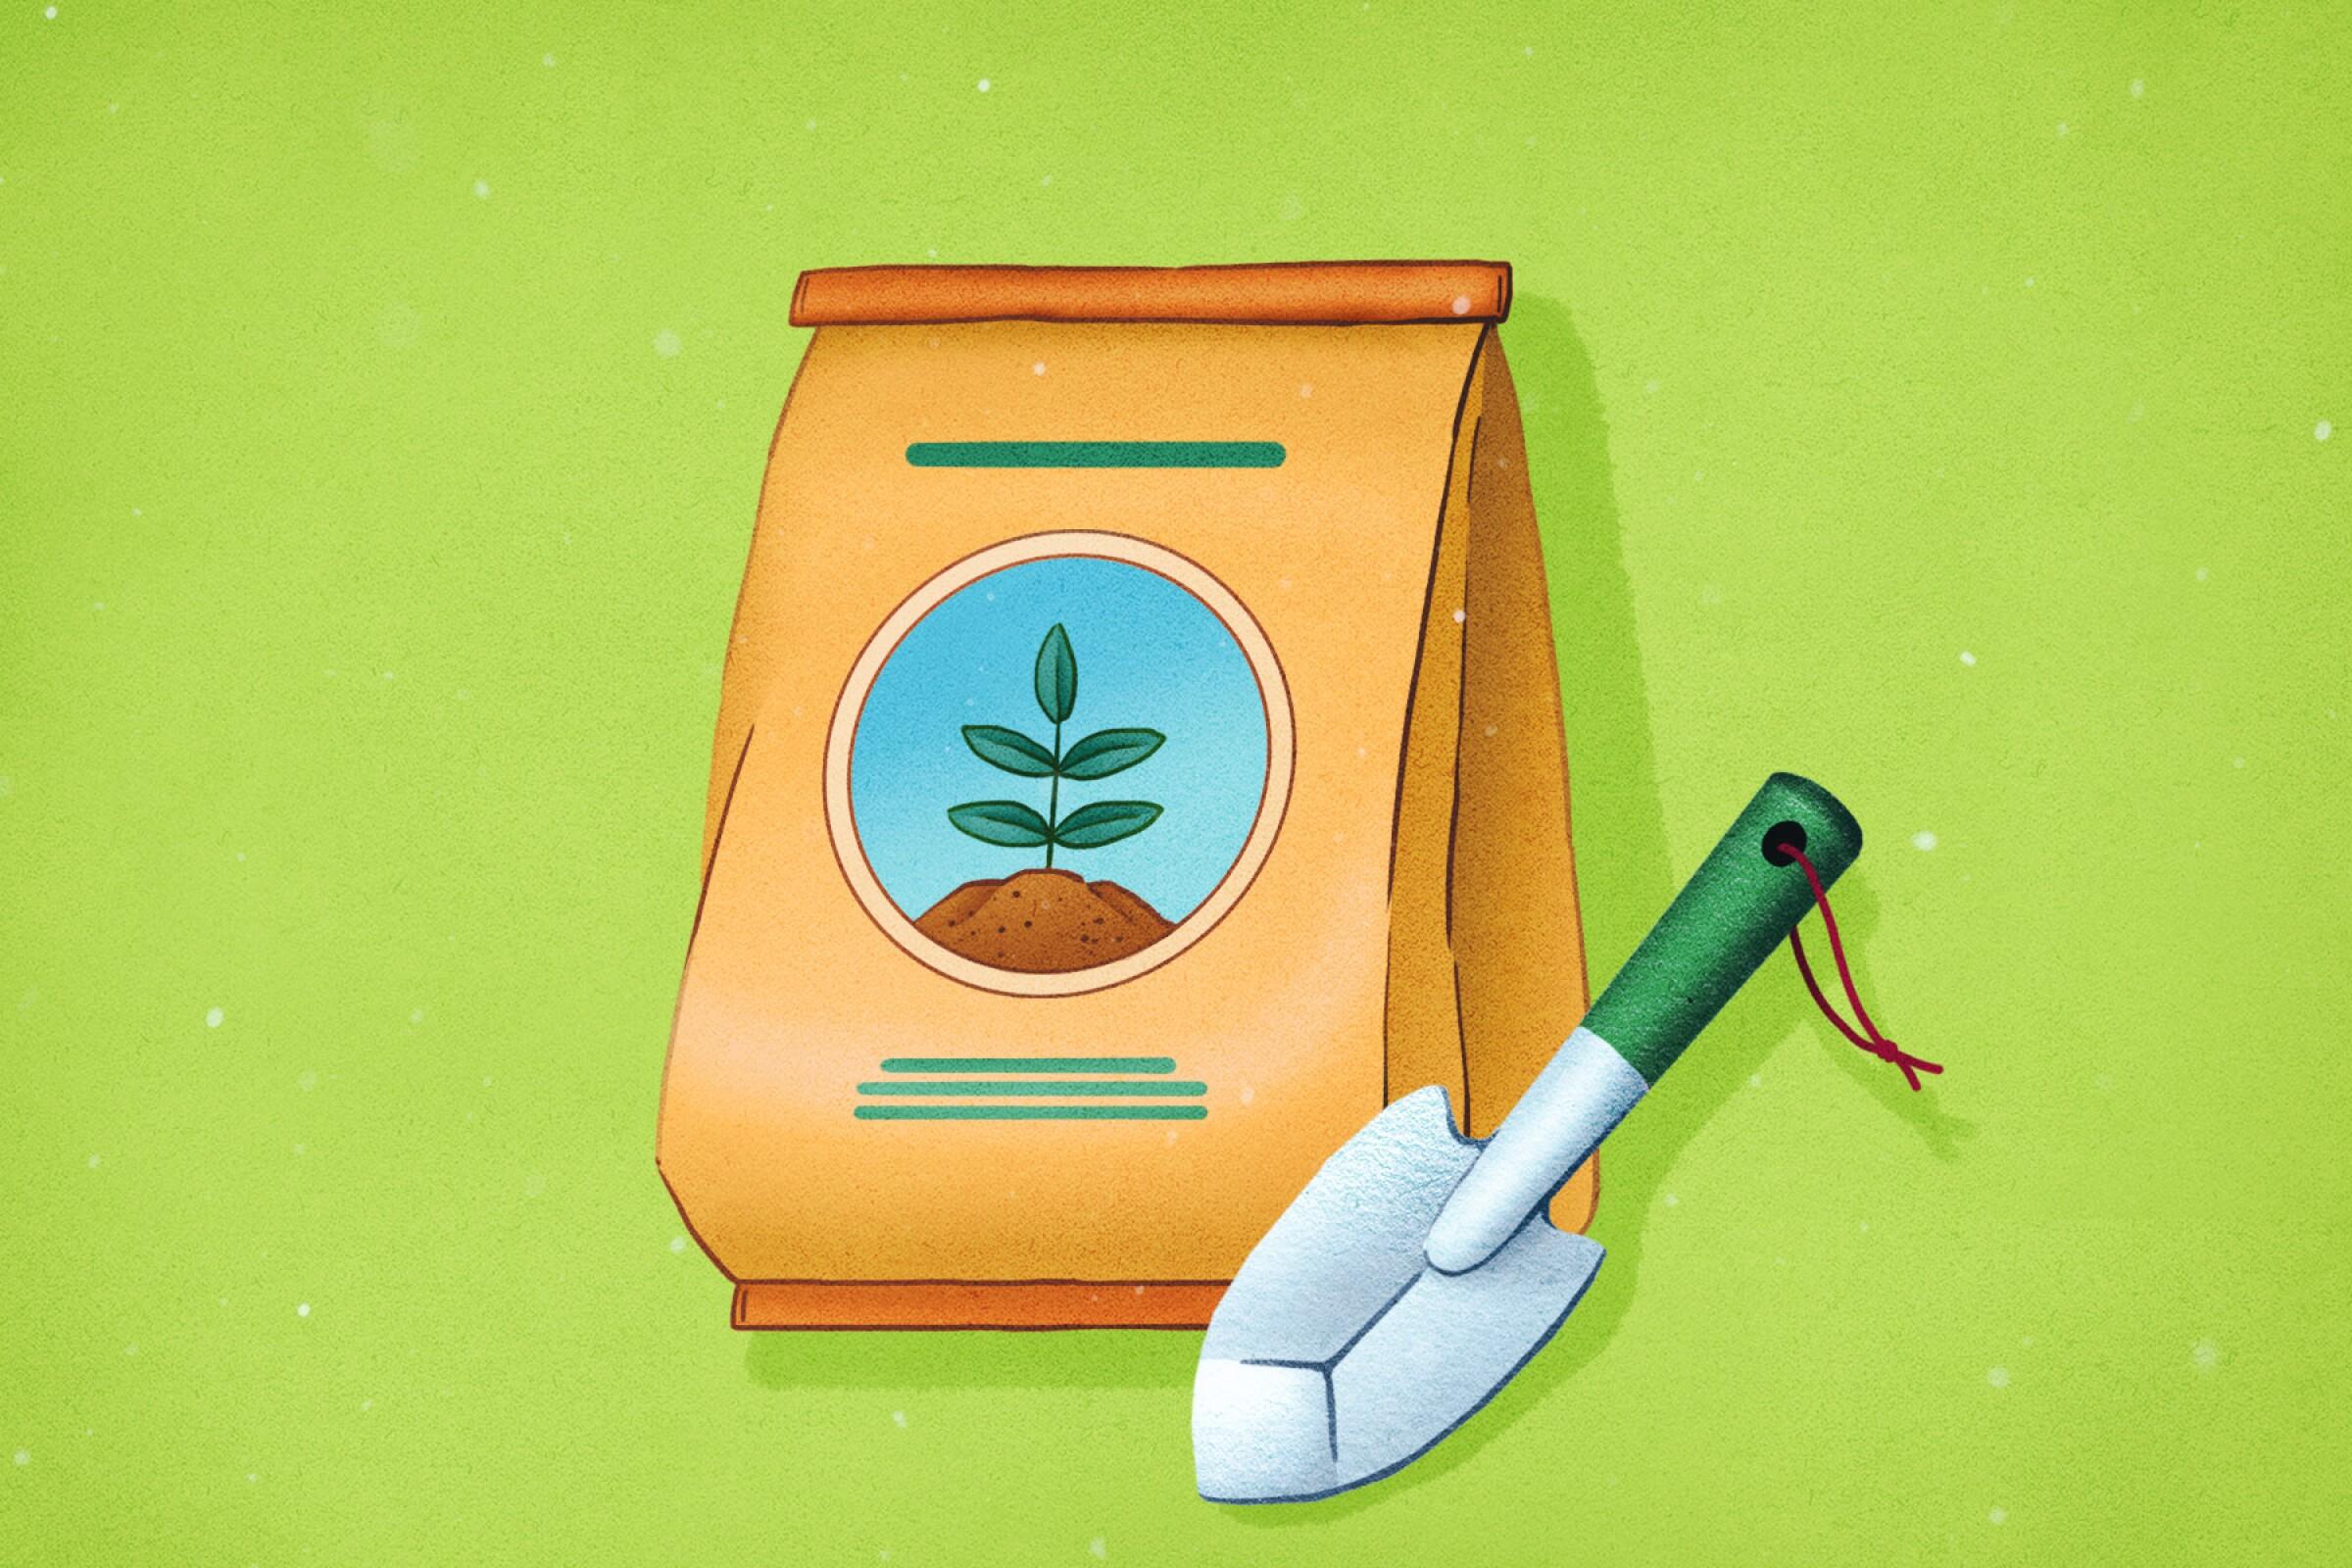 Fertilizer illustration